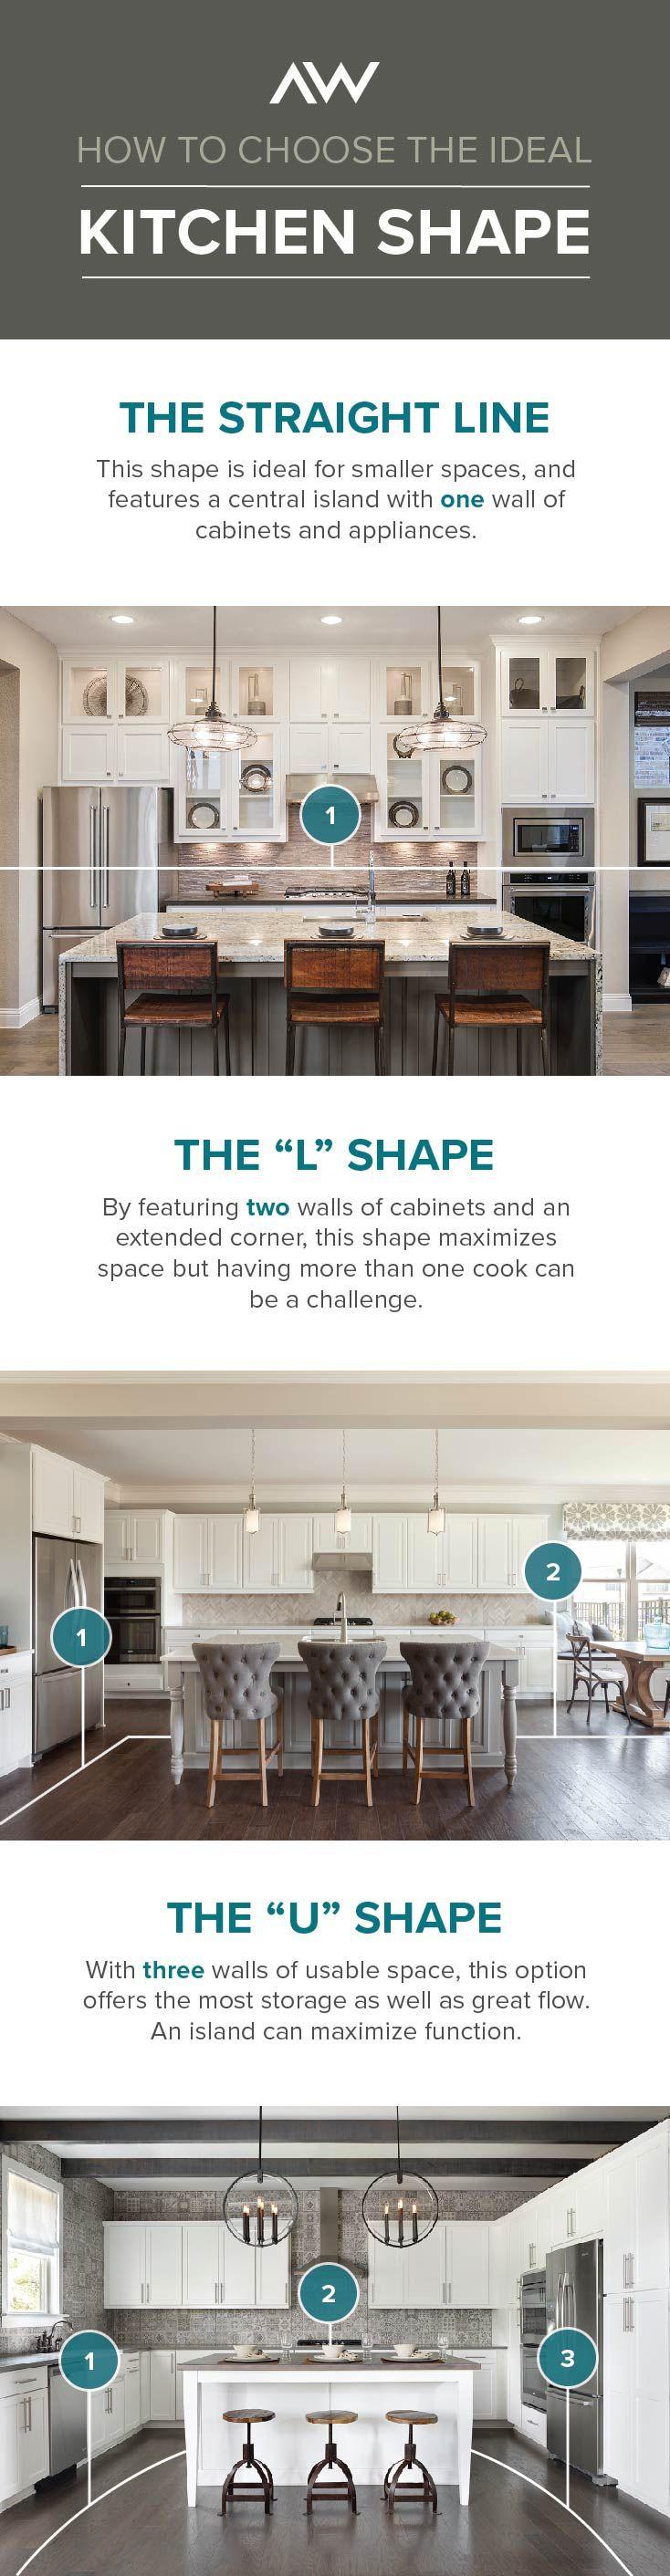 66 best Kitchens images on Pinterest | Design trends, Kitchen ideas ...